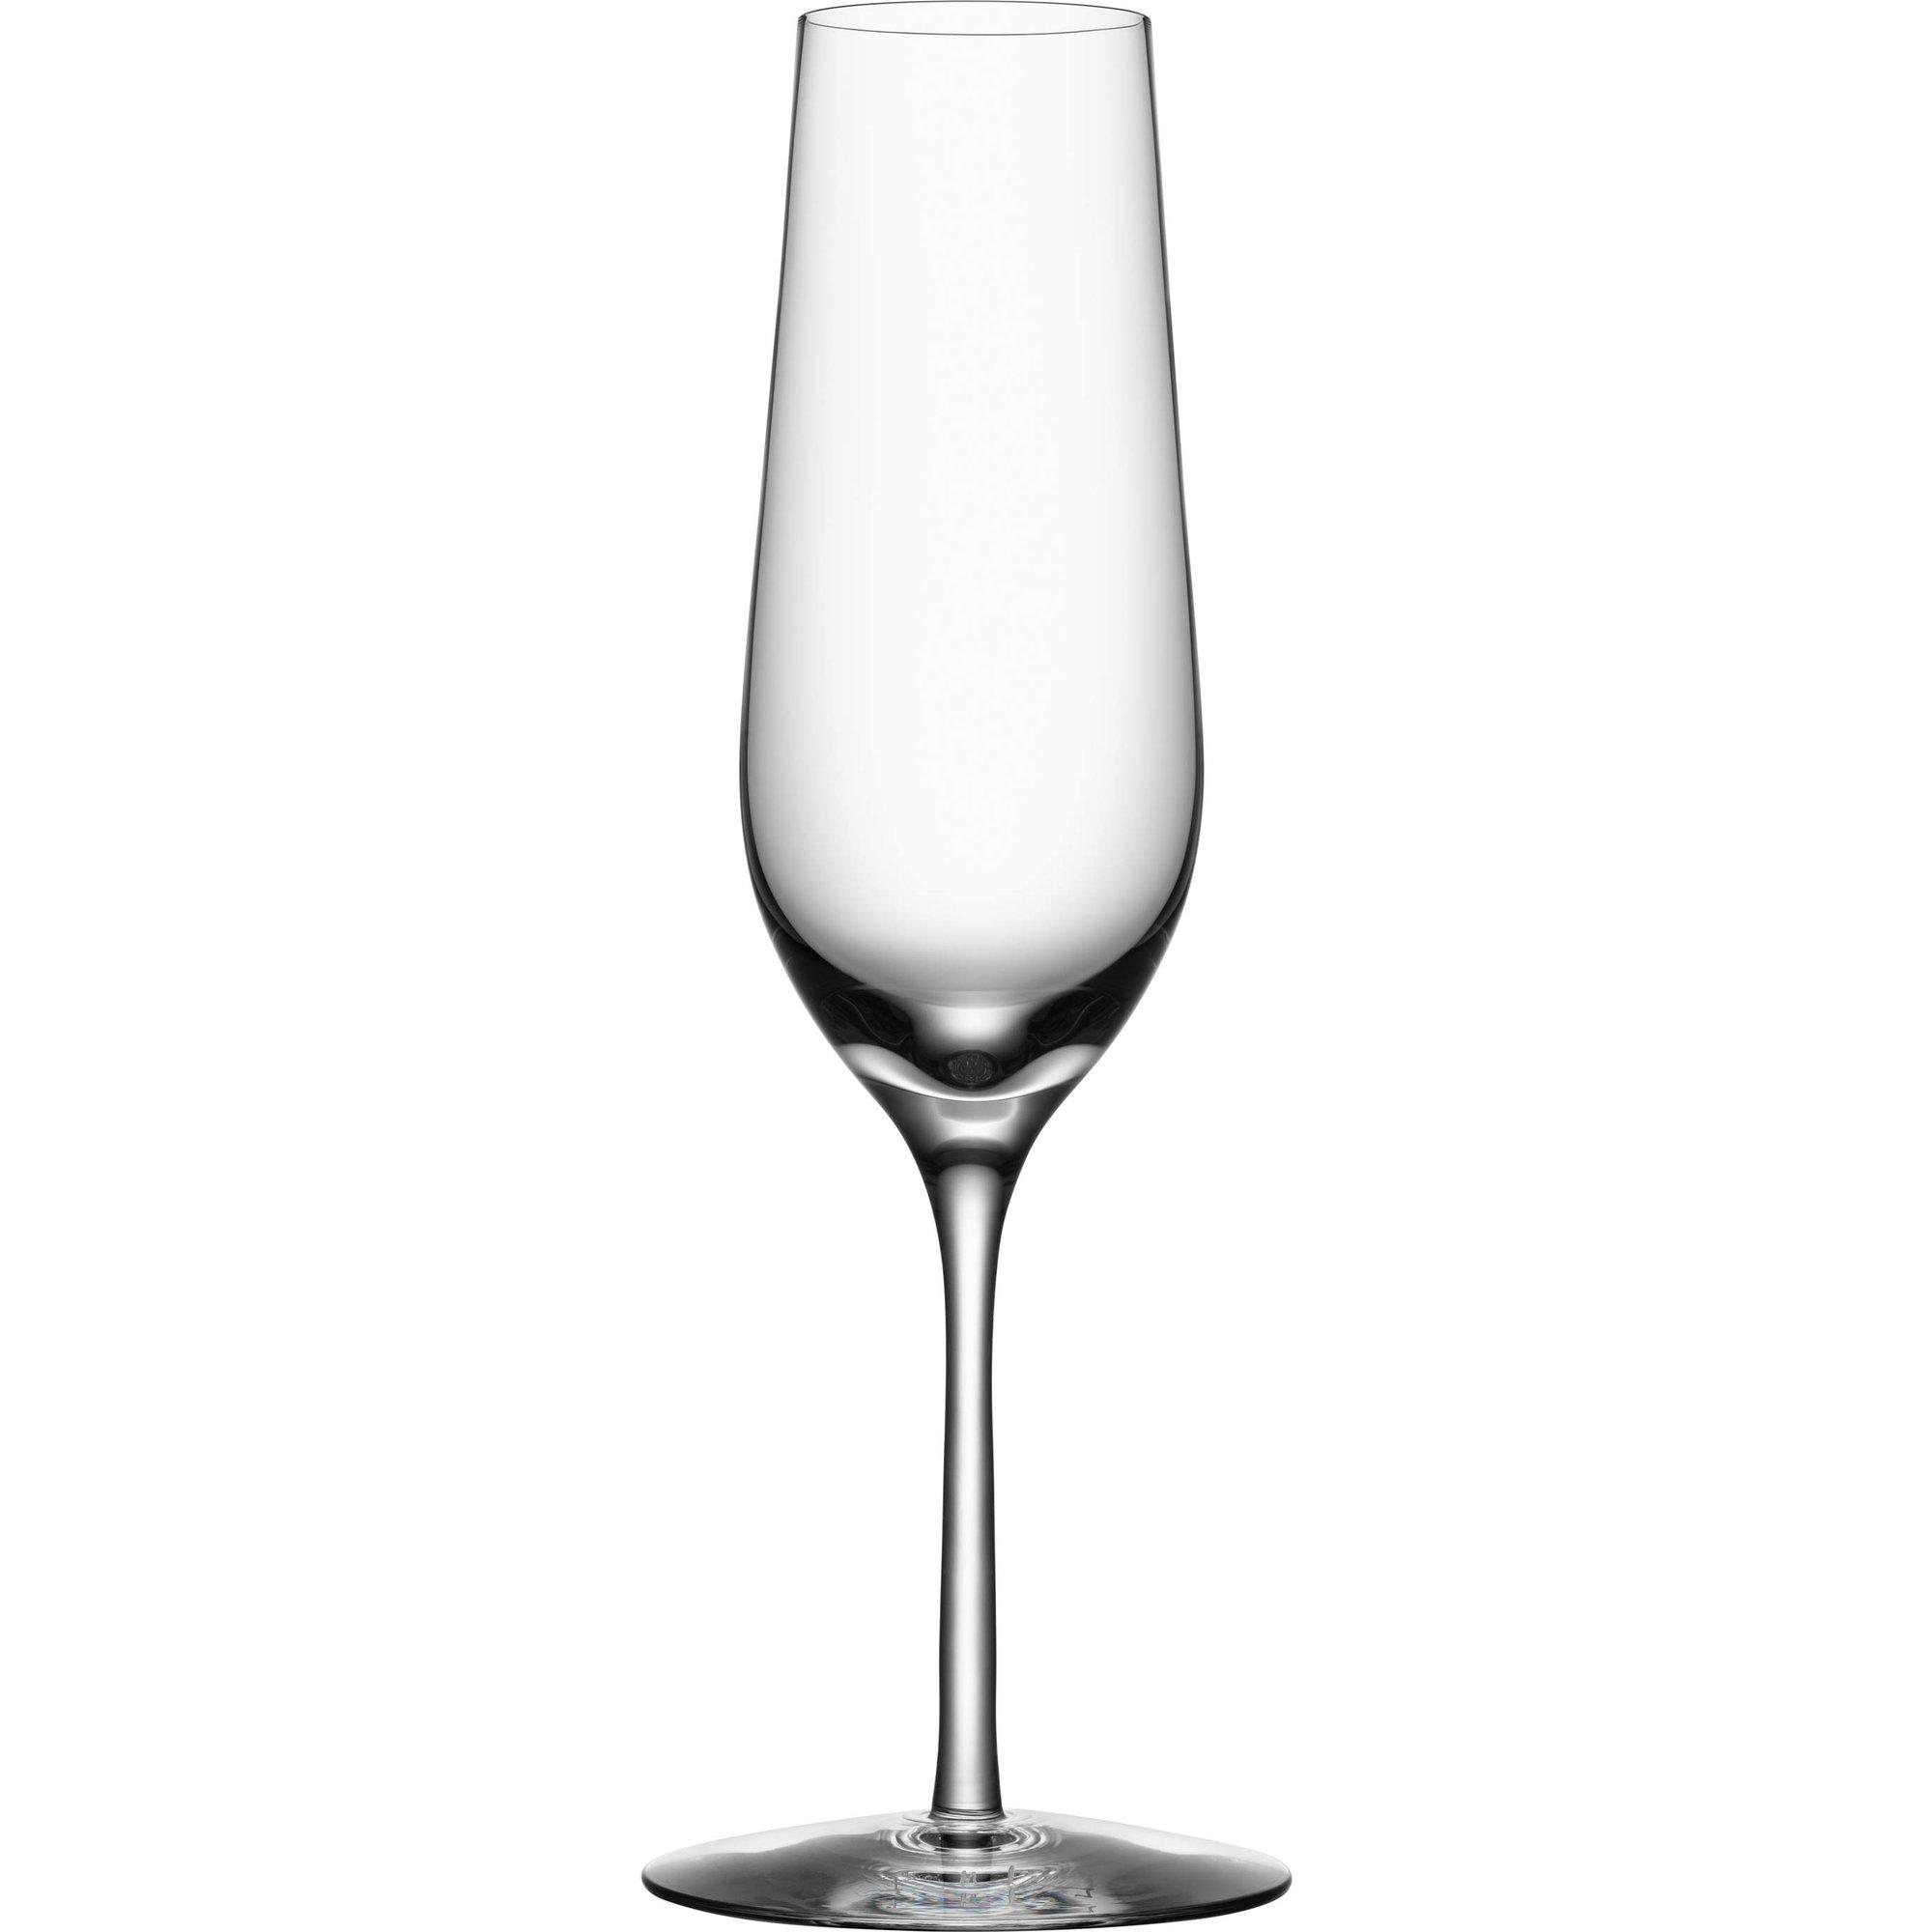 Orrefors Morberg Champagneglasa 24 cl 4-pack